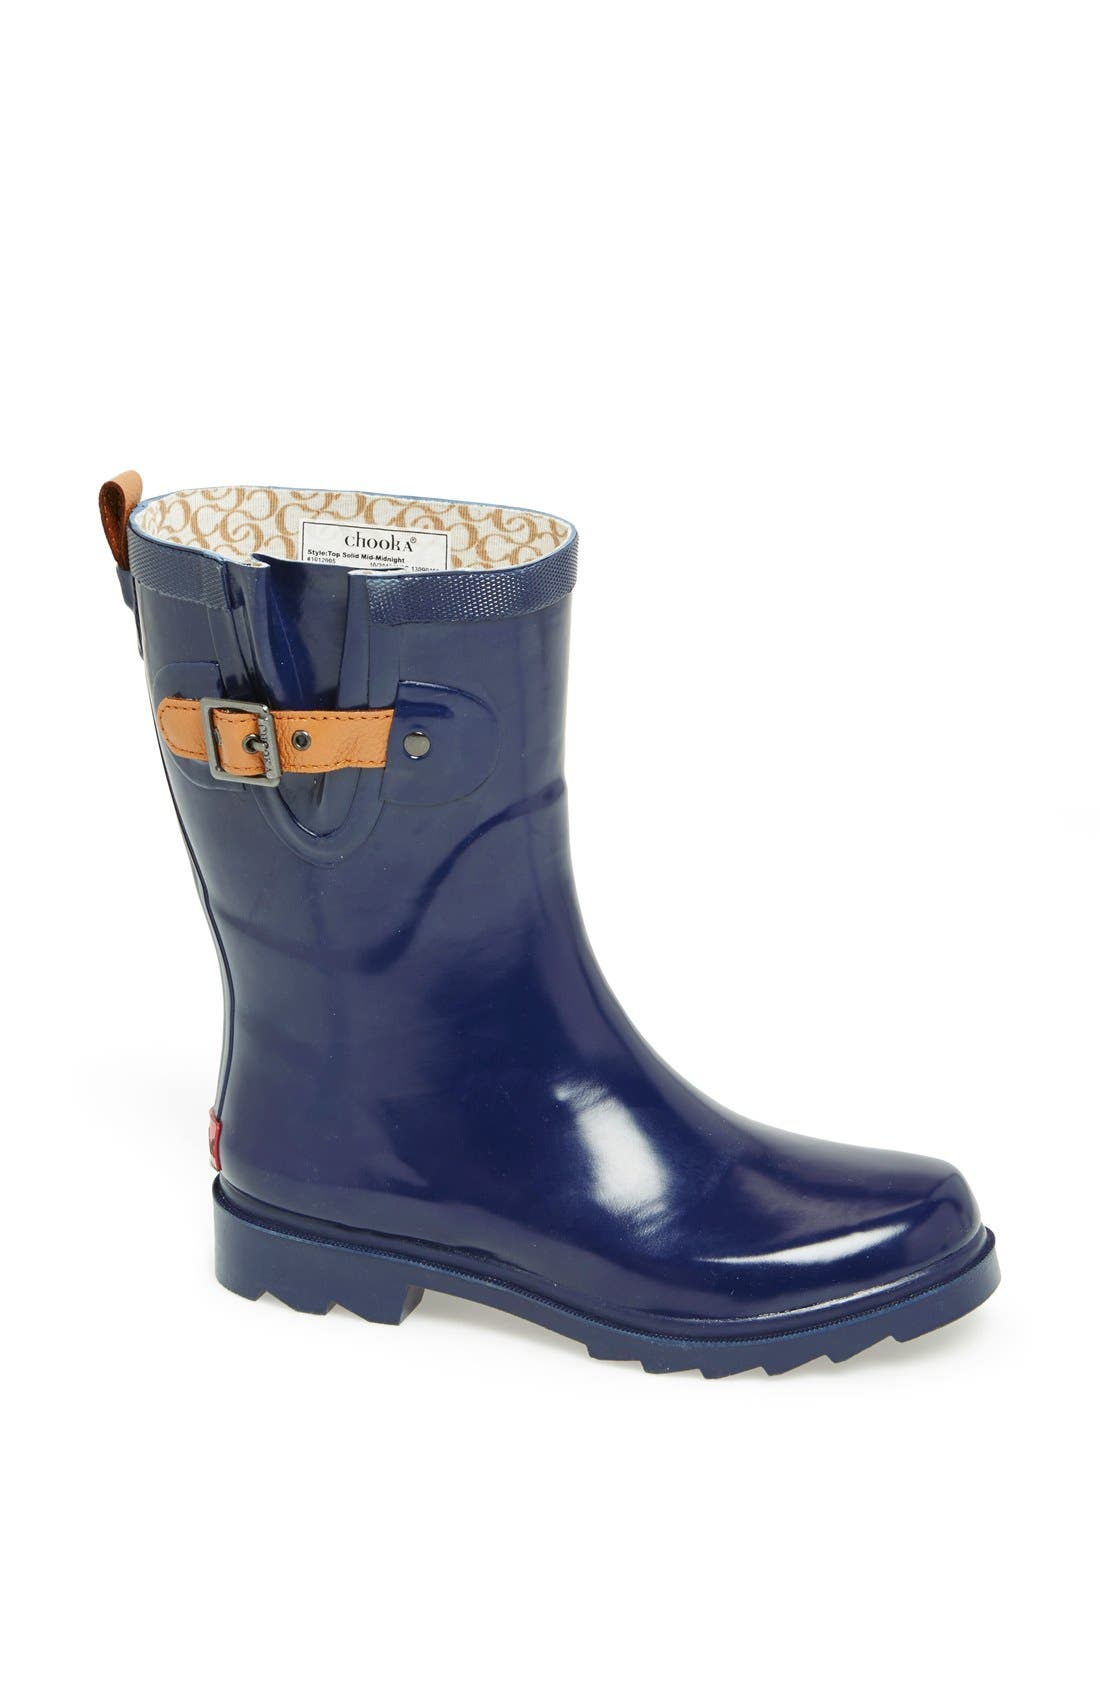 Main Image - Chooka 'Top Solid Mid Height' Rain Boot (Women)